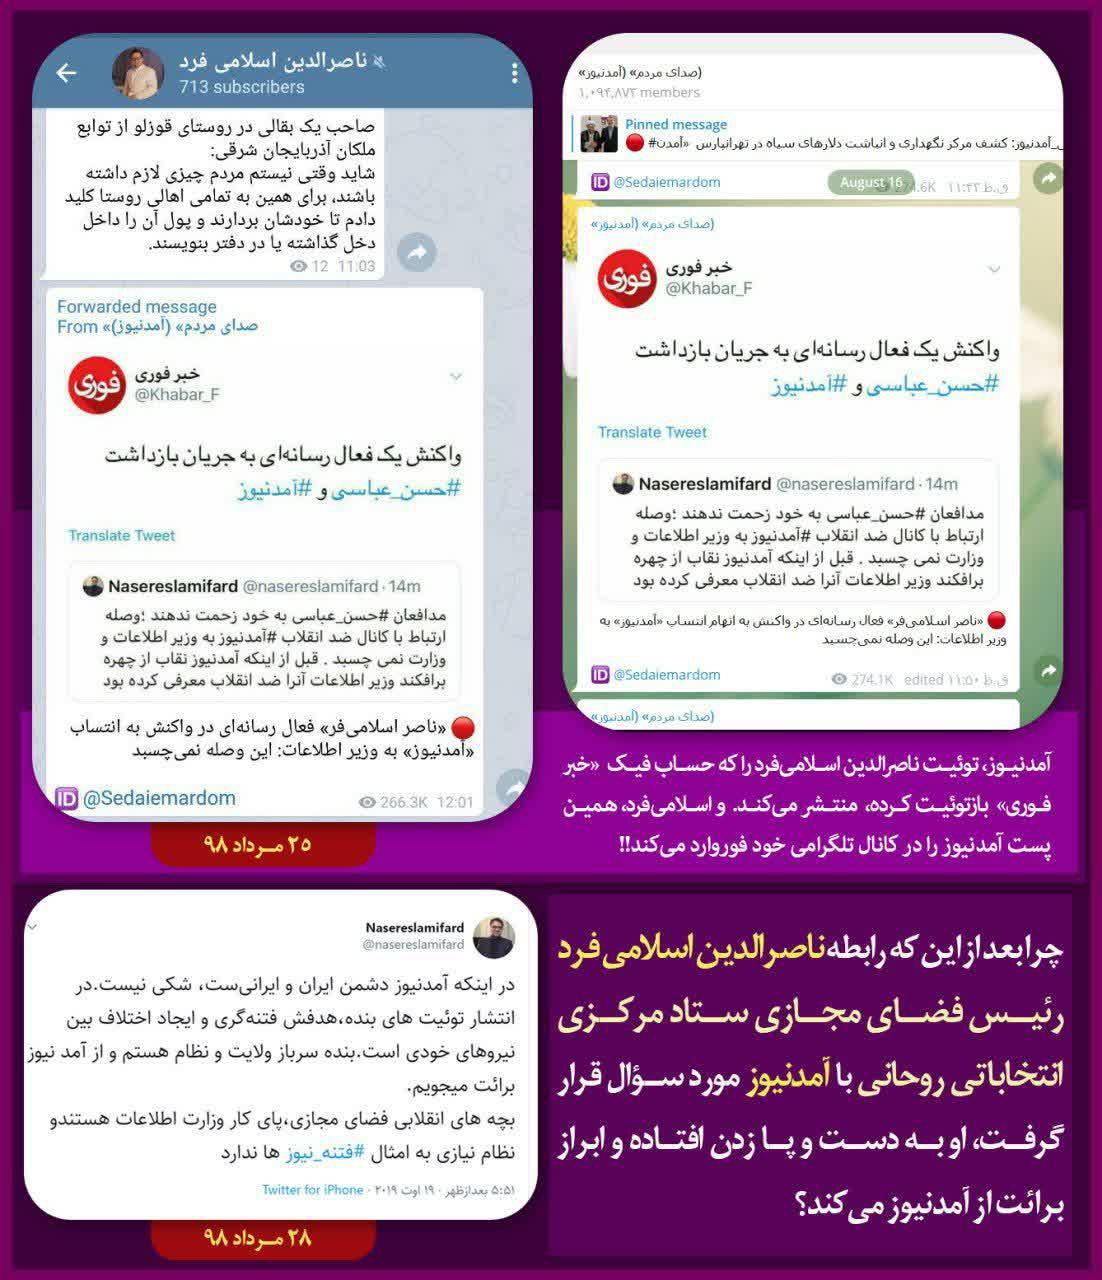 http://dl-abbasi.ir/yekta/1398/Graphic/eslamifard/eslamifard%20(6).jpg